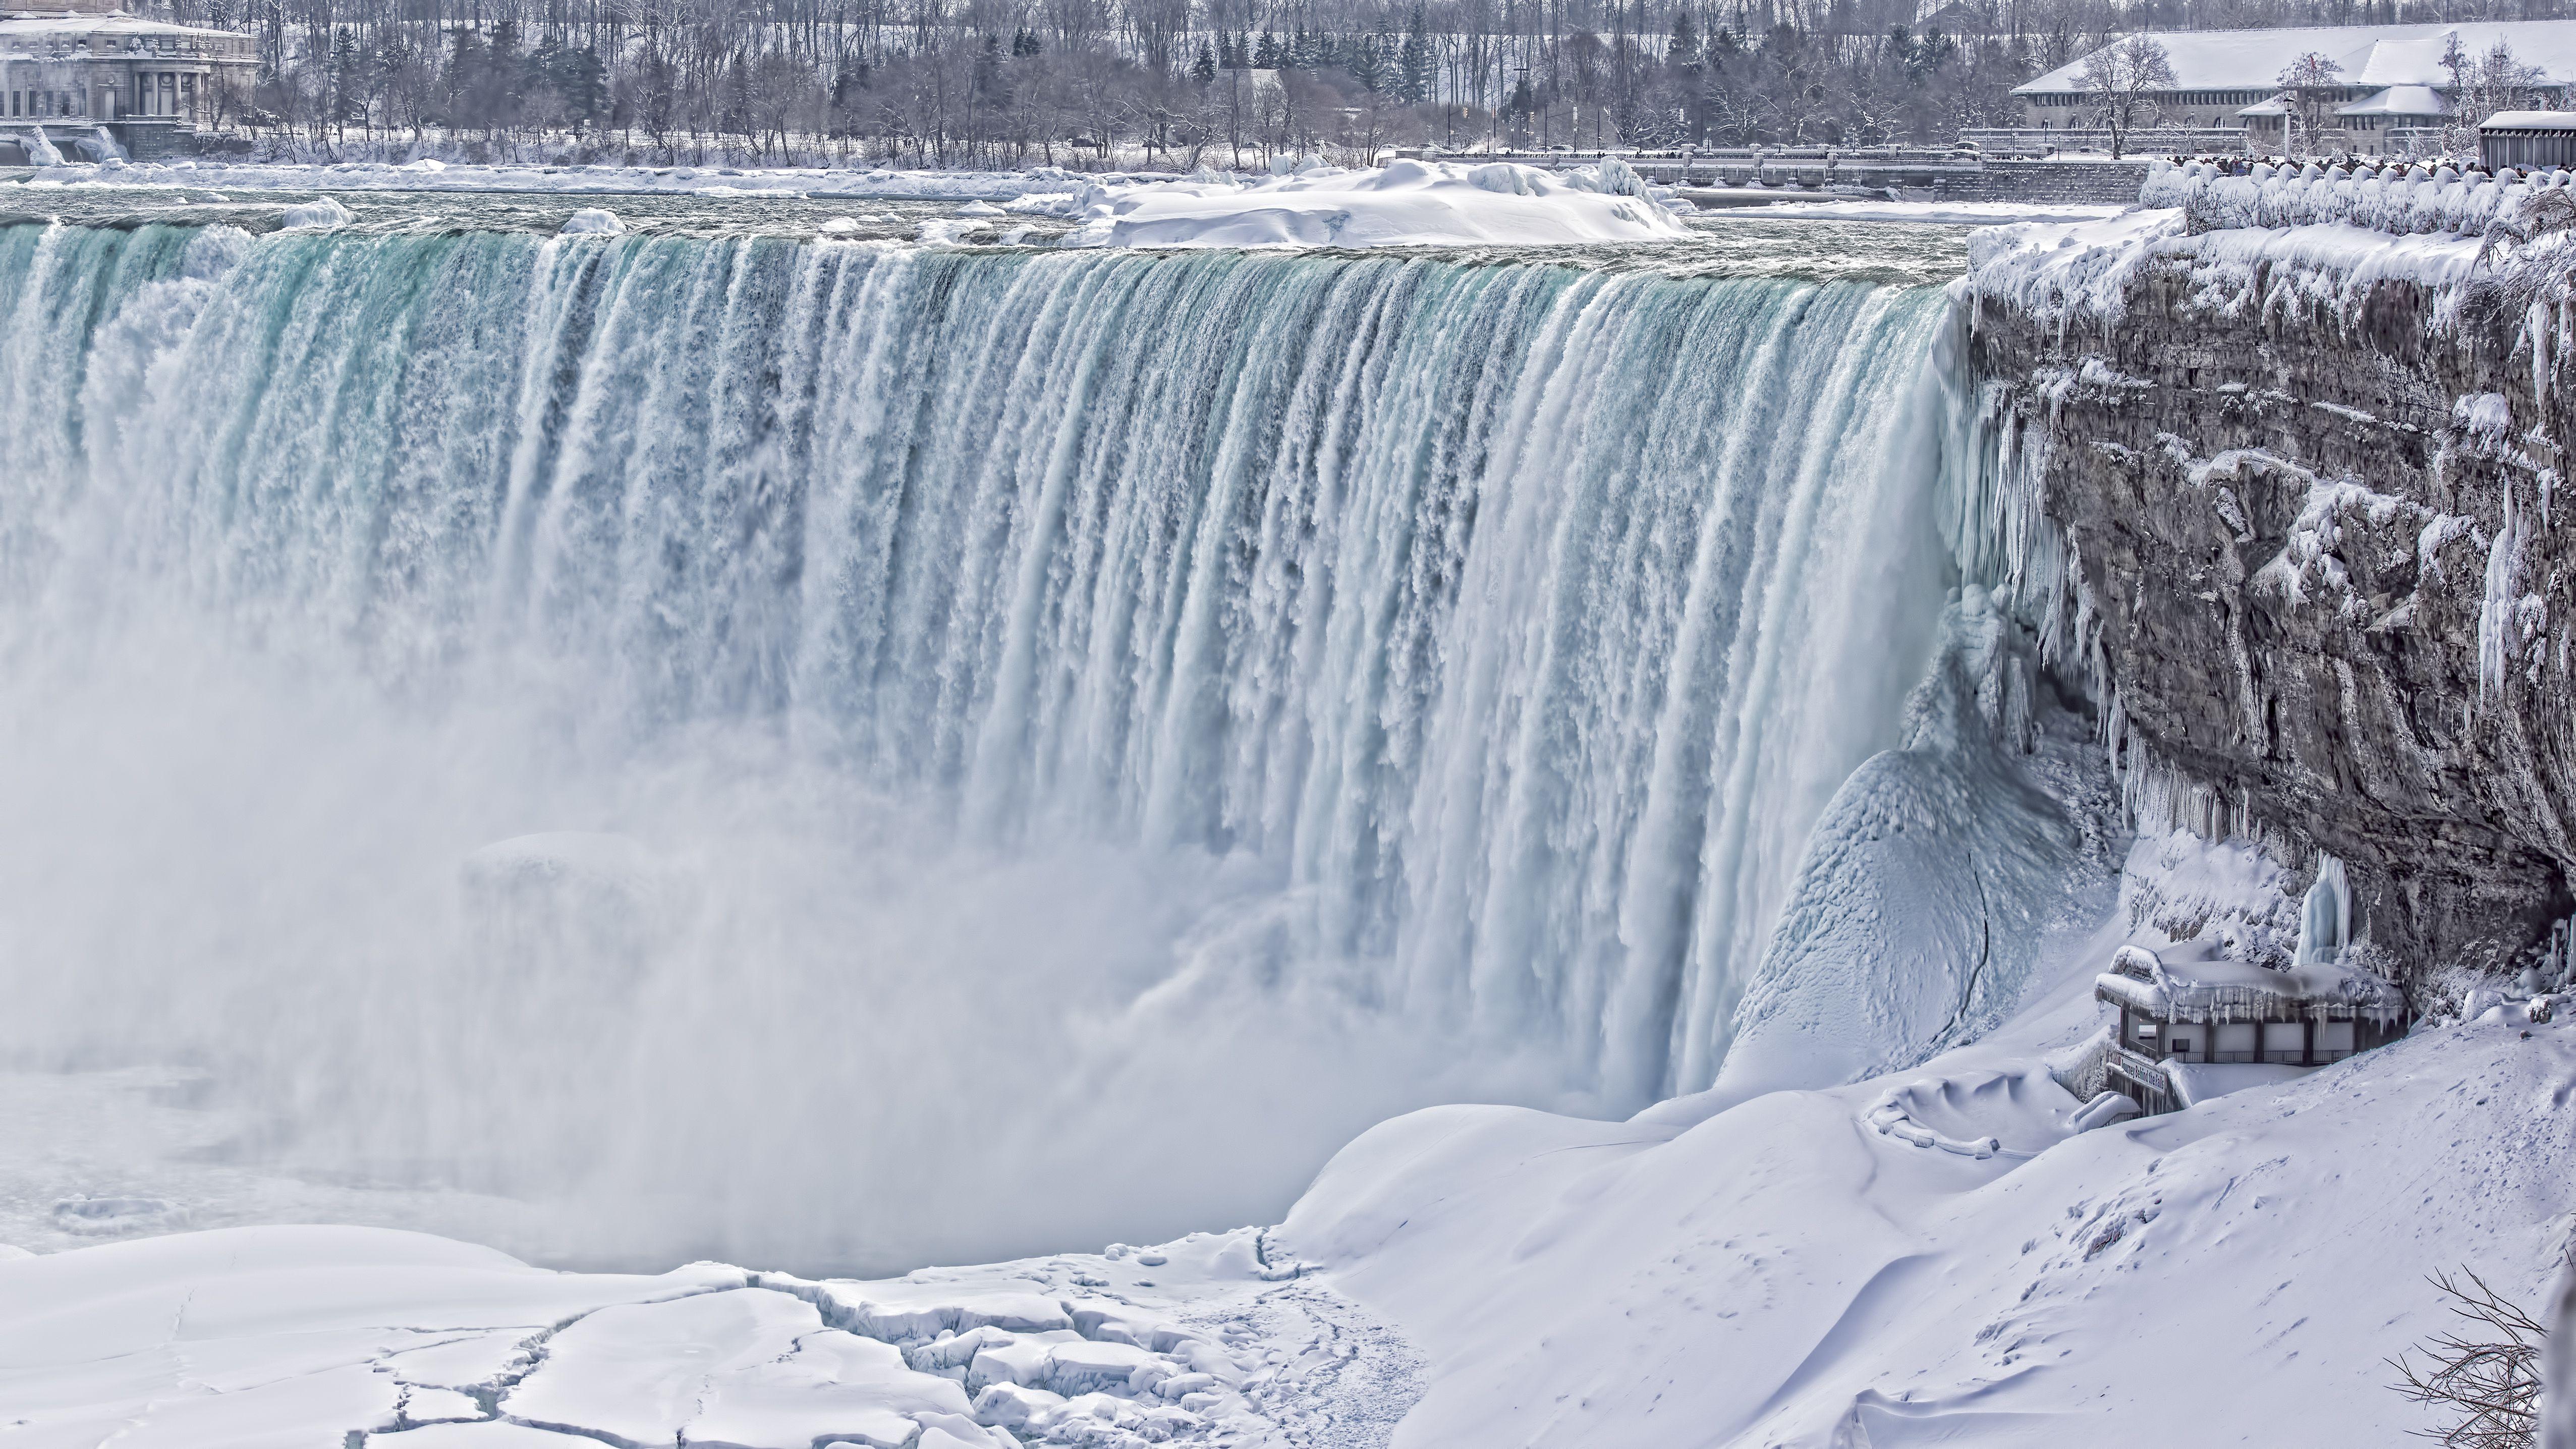 Horse Shoe Falls (Niagara Falls) iced